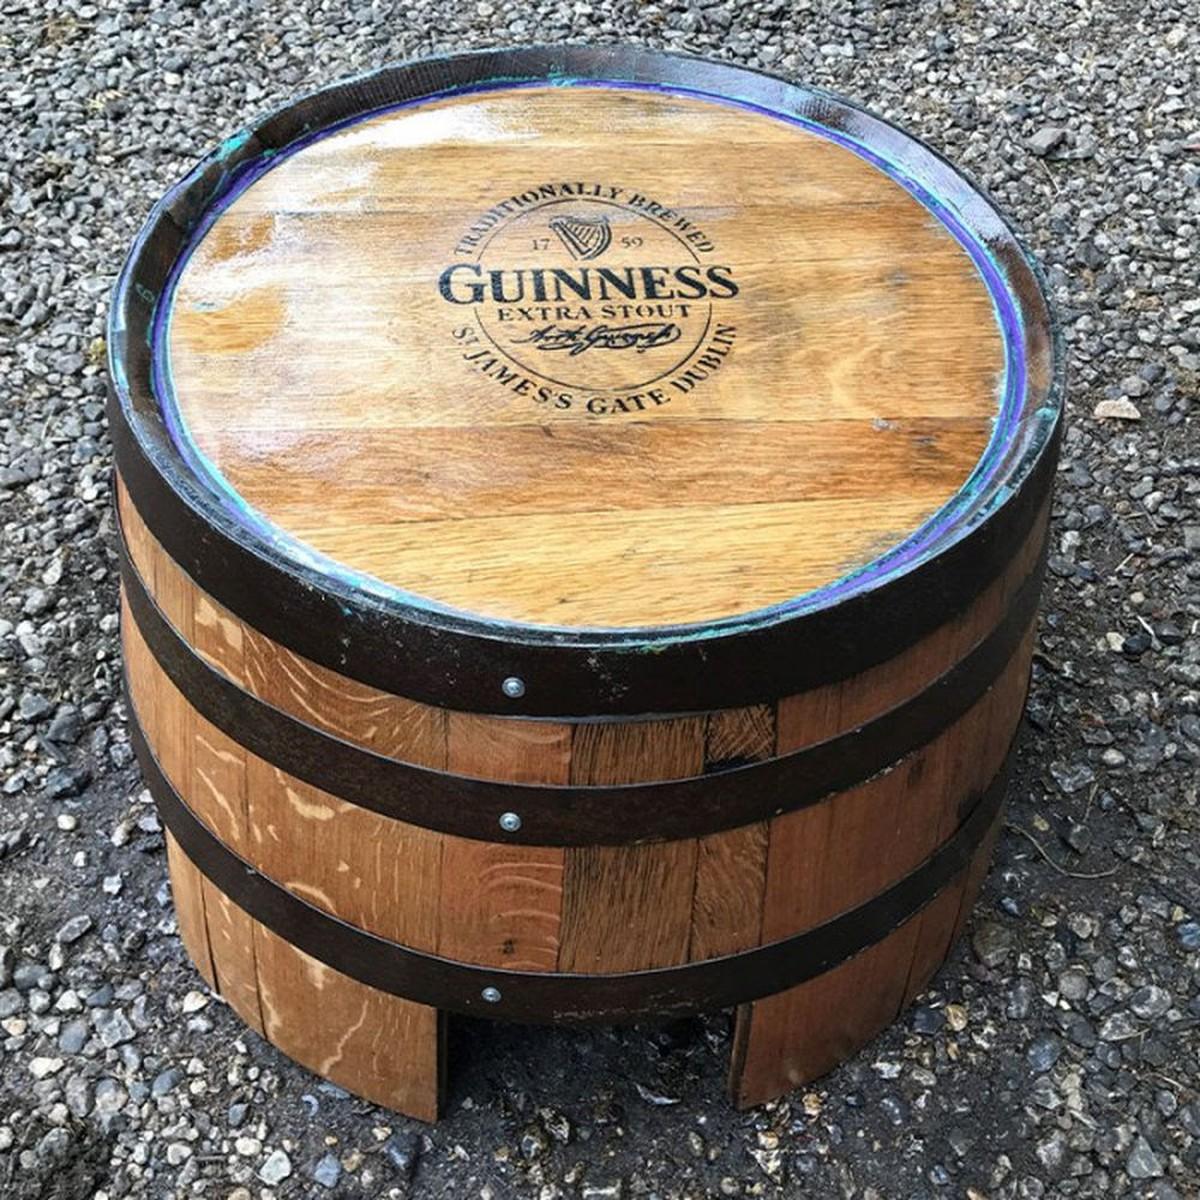 Secondhand Pub Equipment Pub Tables 18x Guinness Pub